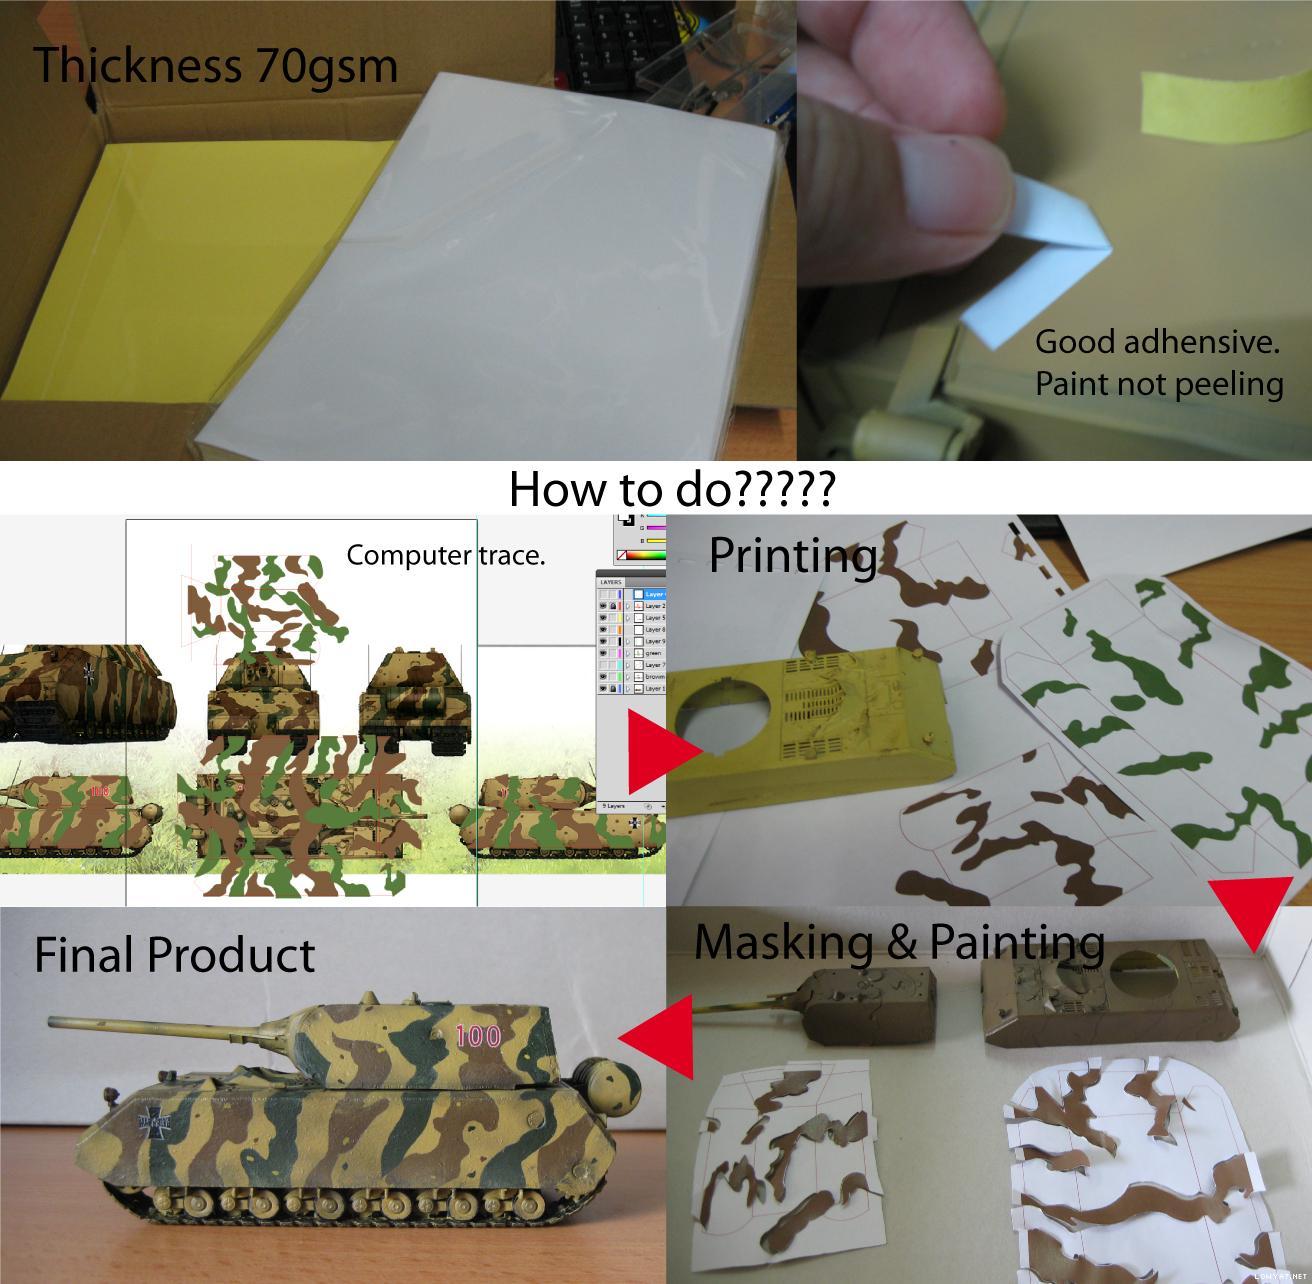 Color printing lowyat -  Img Https Forum Lowyat Net Uploads Attach 58 Post 529358 1398045067 Jpg